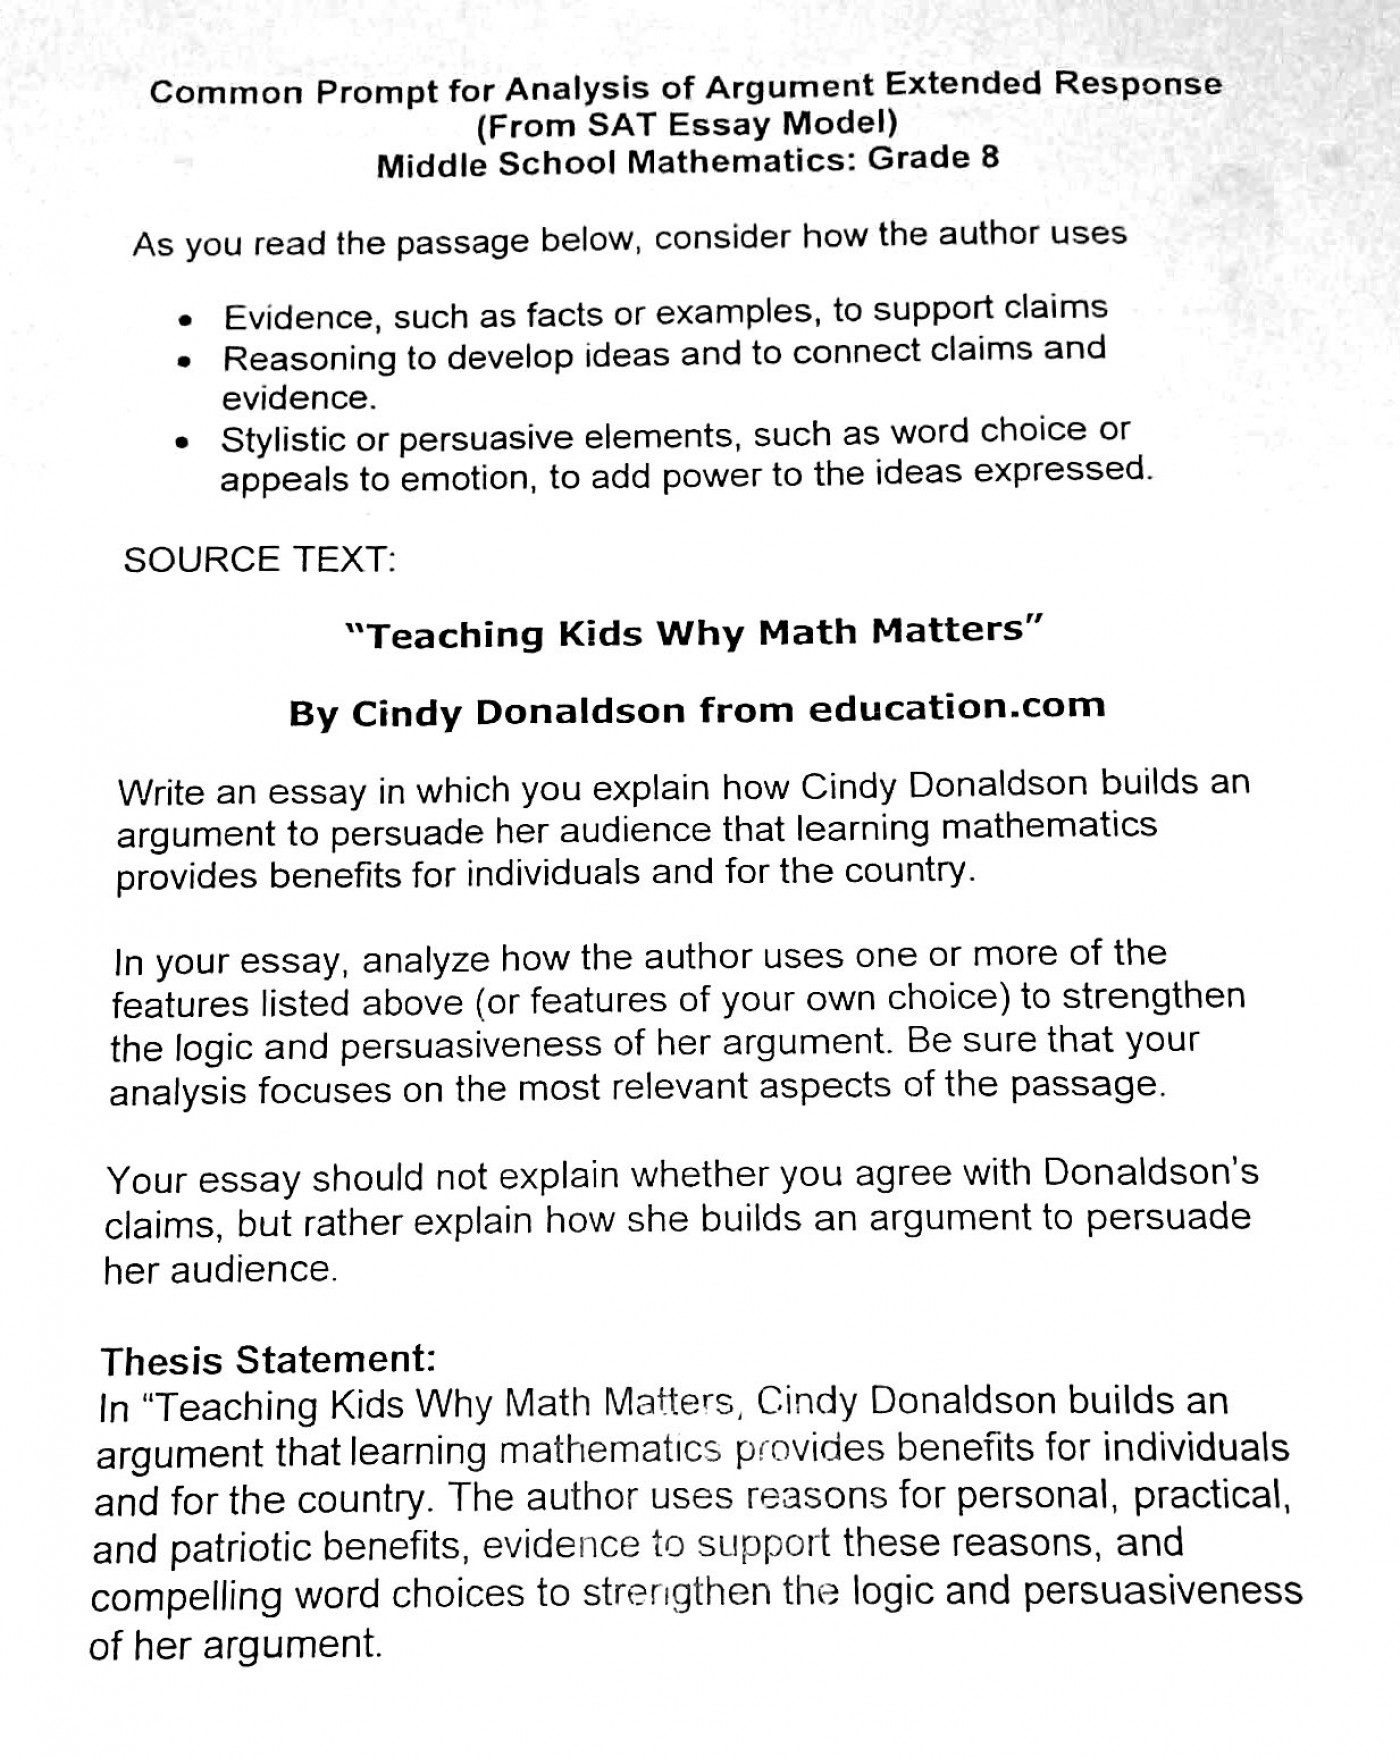 006 Gre Argument Essay Template Debate Essays Formats Analyze An Topics Answers Writingp Ets Pdf Marvelous Prompts Persuasive High School 1400